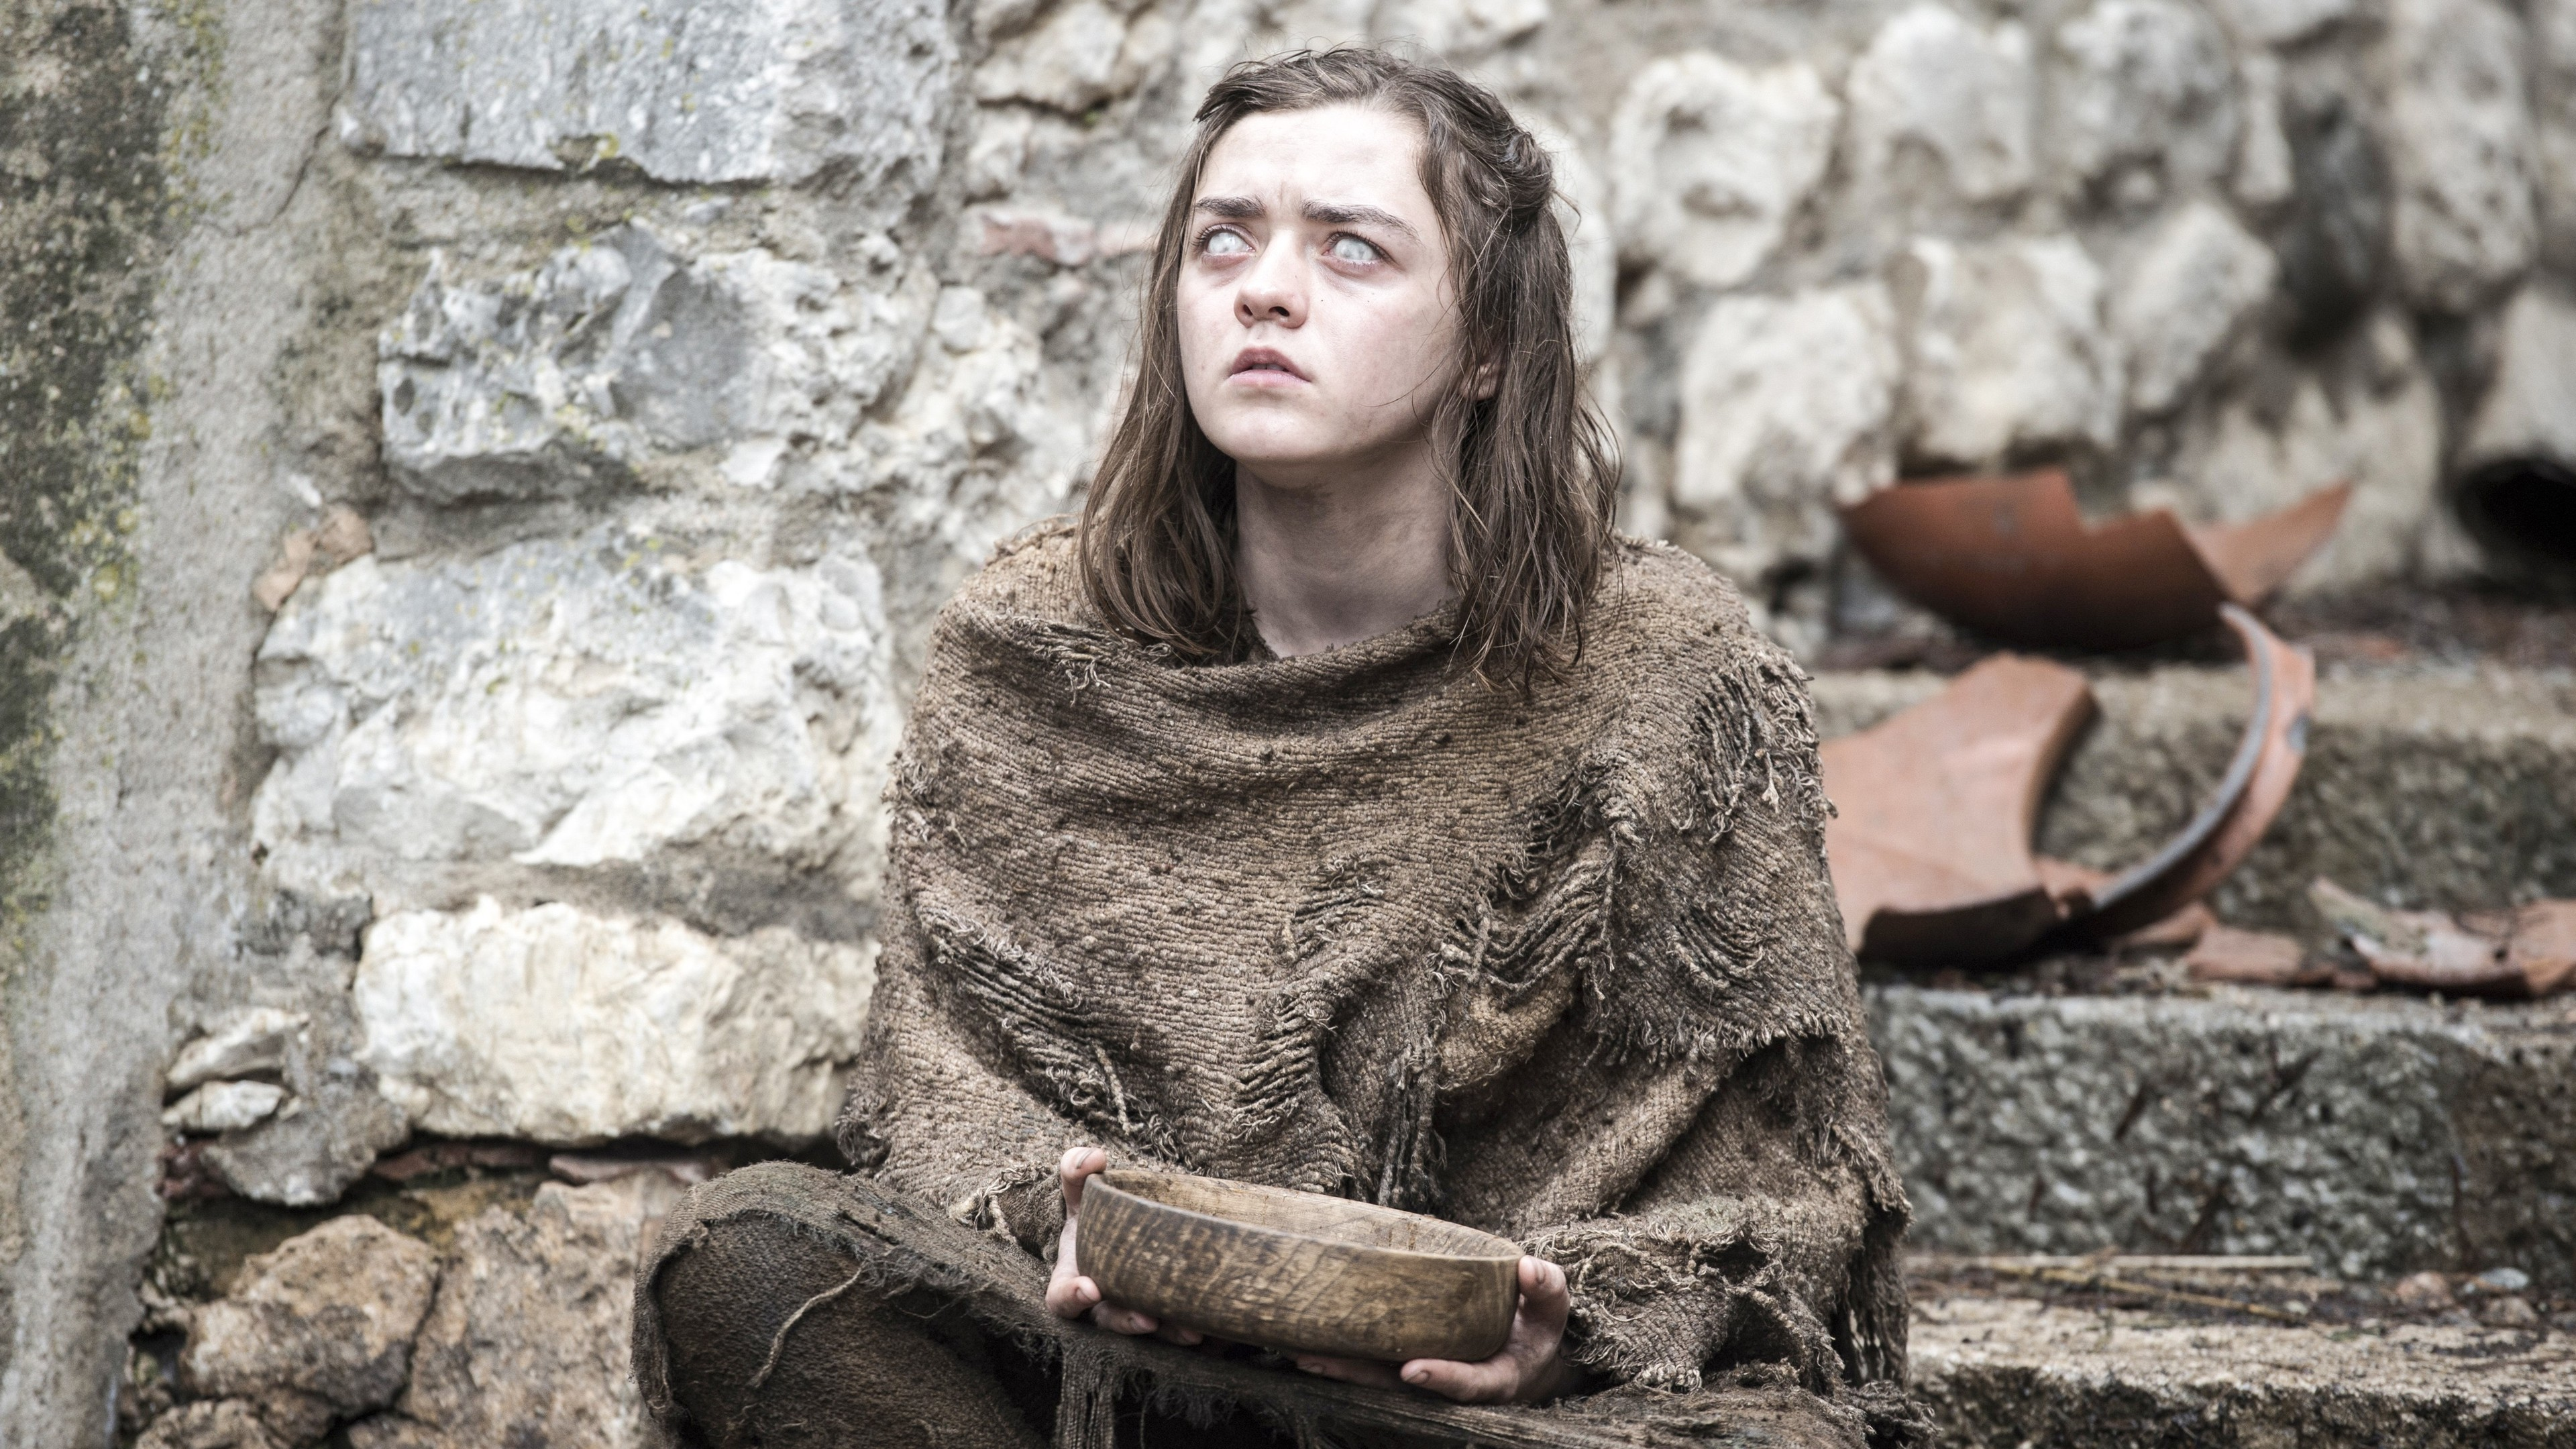 Season 6 Game Of Thrones Arya Stark, HD Tv Shows, 4k